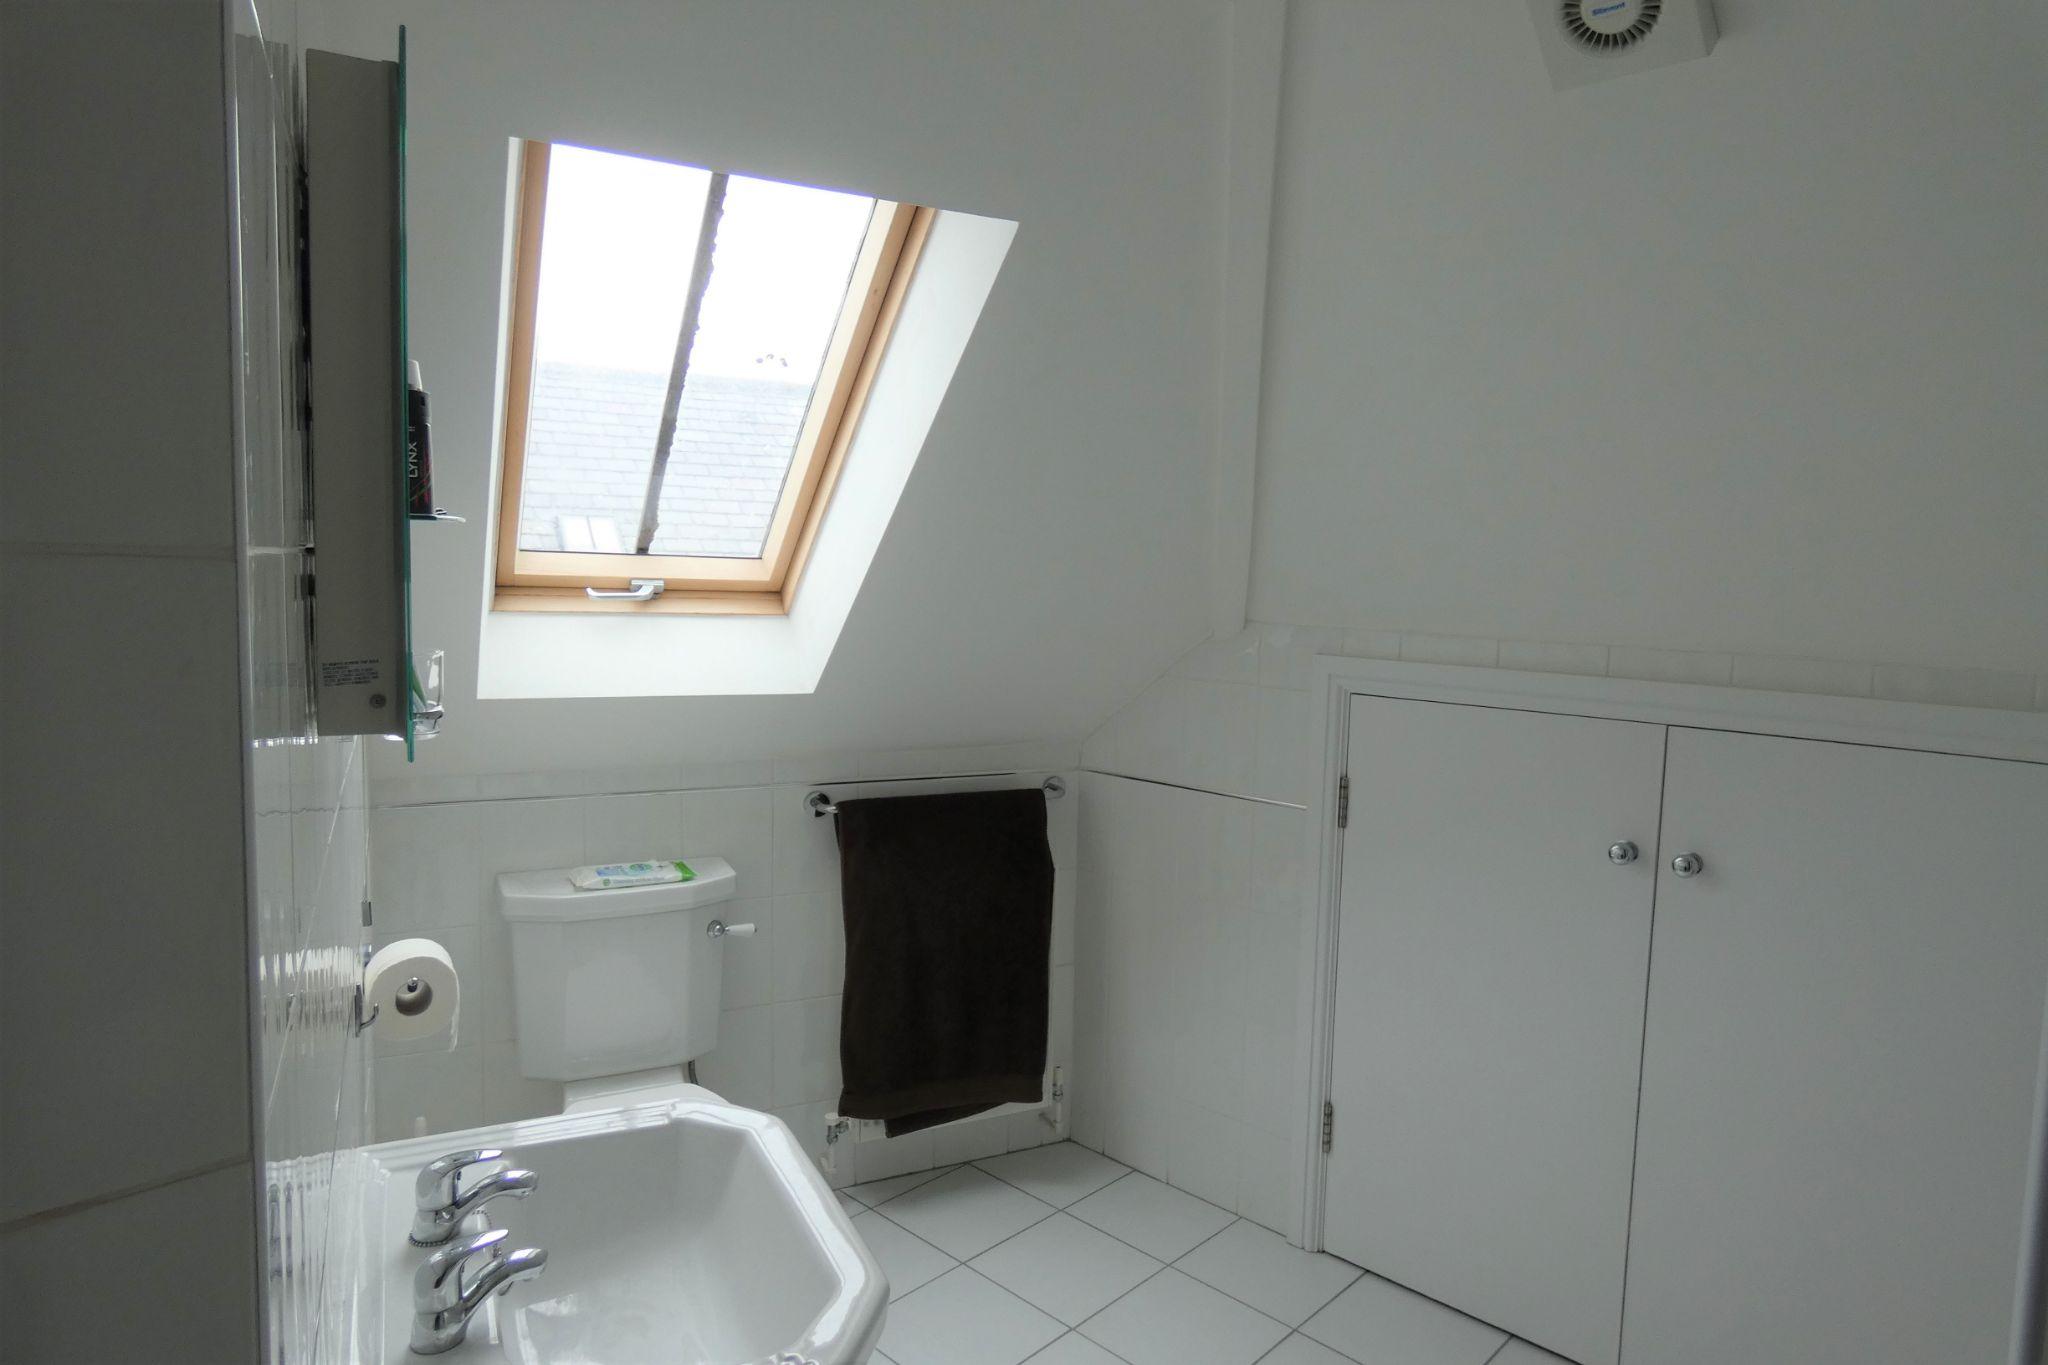 1 bedroom apartment flat/apartment SSTC in Peel - Photograph 7